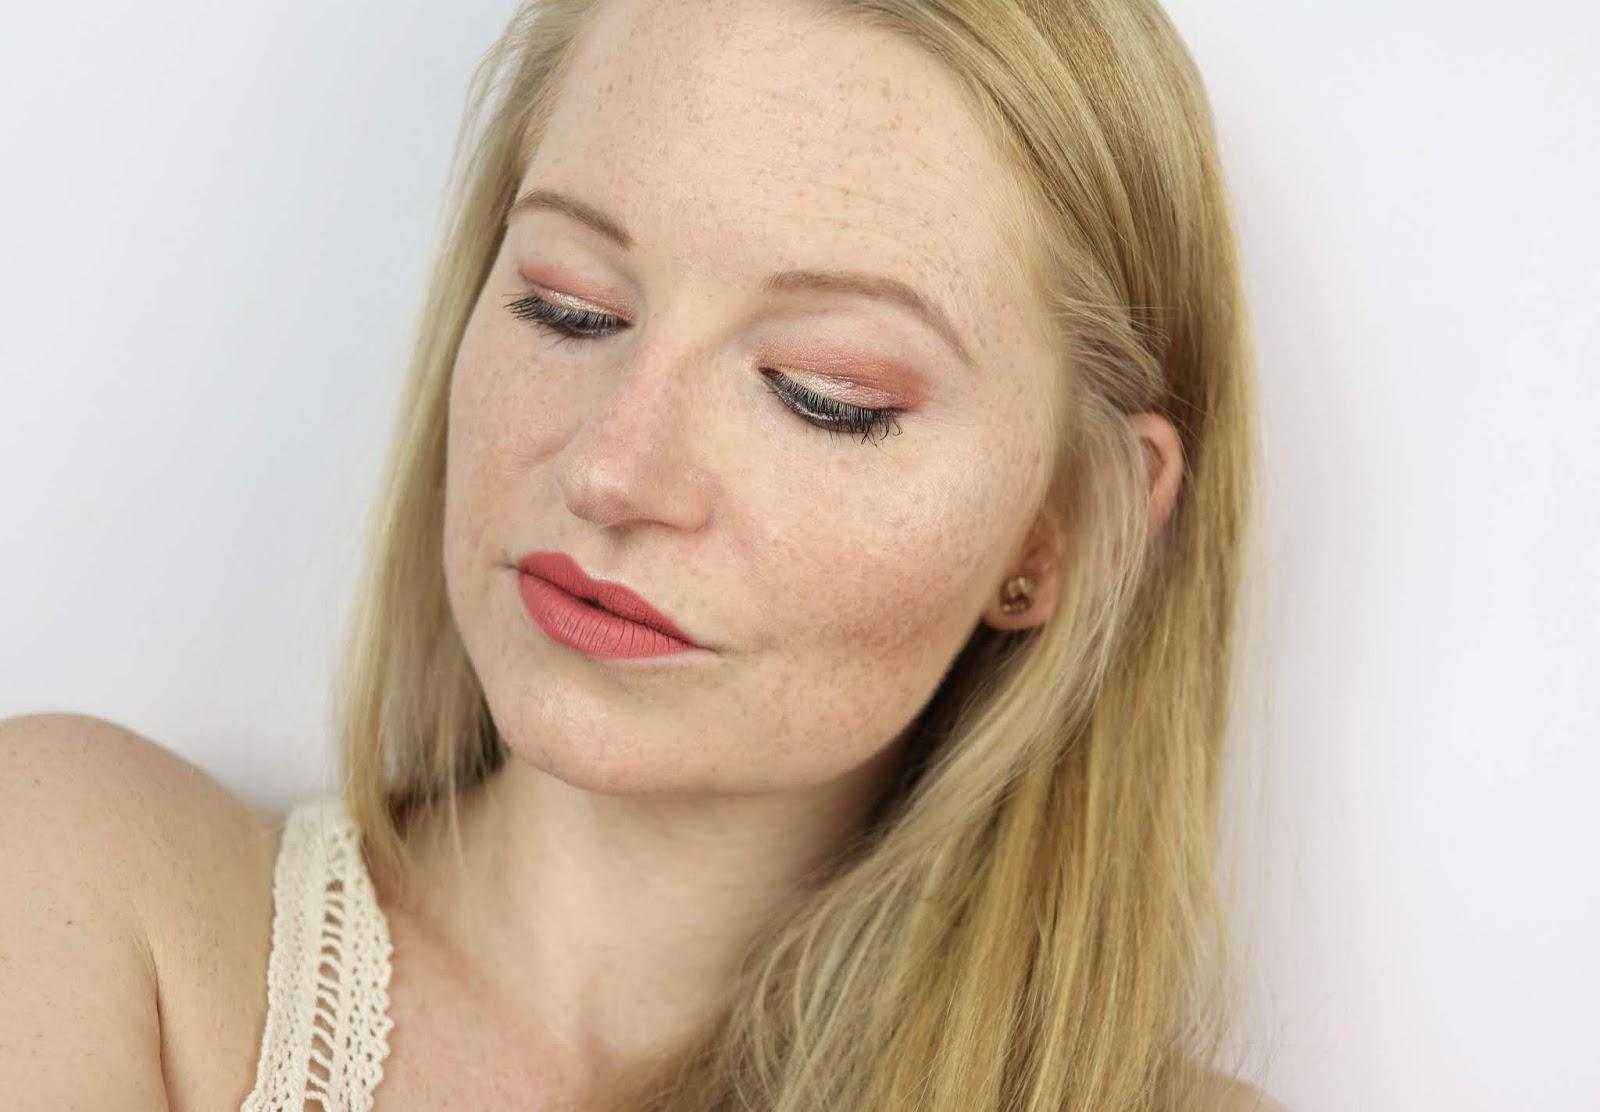 beauty, cosmetics, Illuminating Tint & Conceal, lash booster mascara, make-up look, MatteLast Liquid Lip, Pixi Beauty X Weylie Hoang, review, roseglow eye pen, schlupflider, swatches, tragebilder,